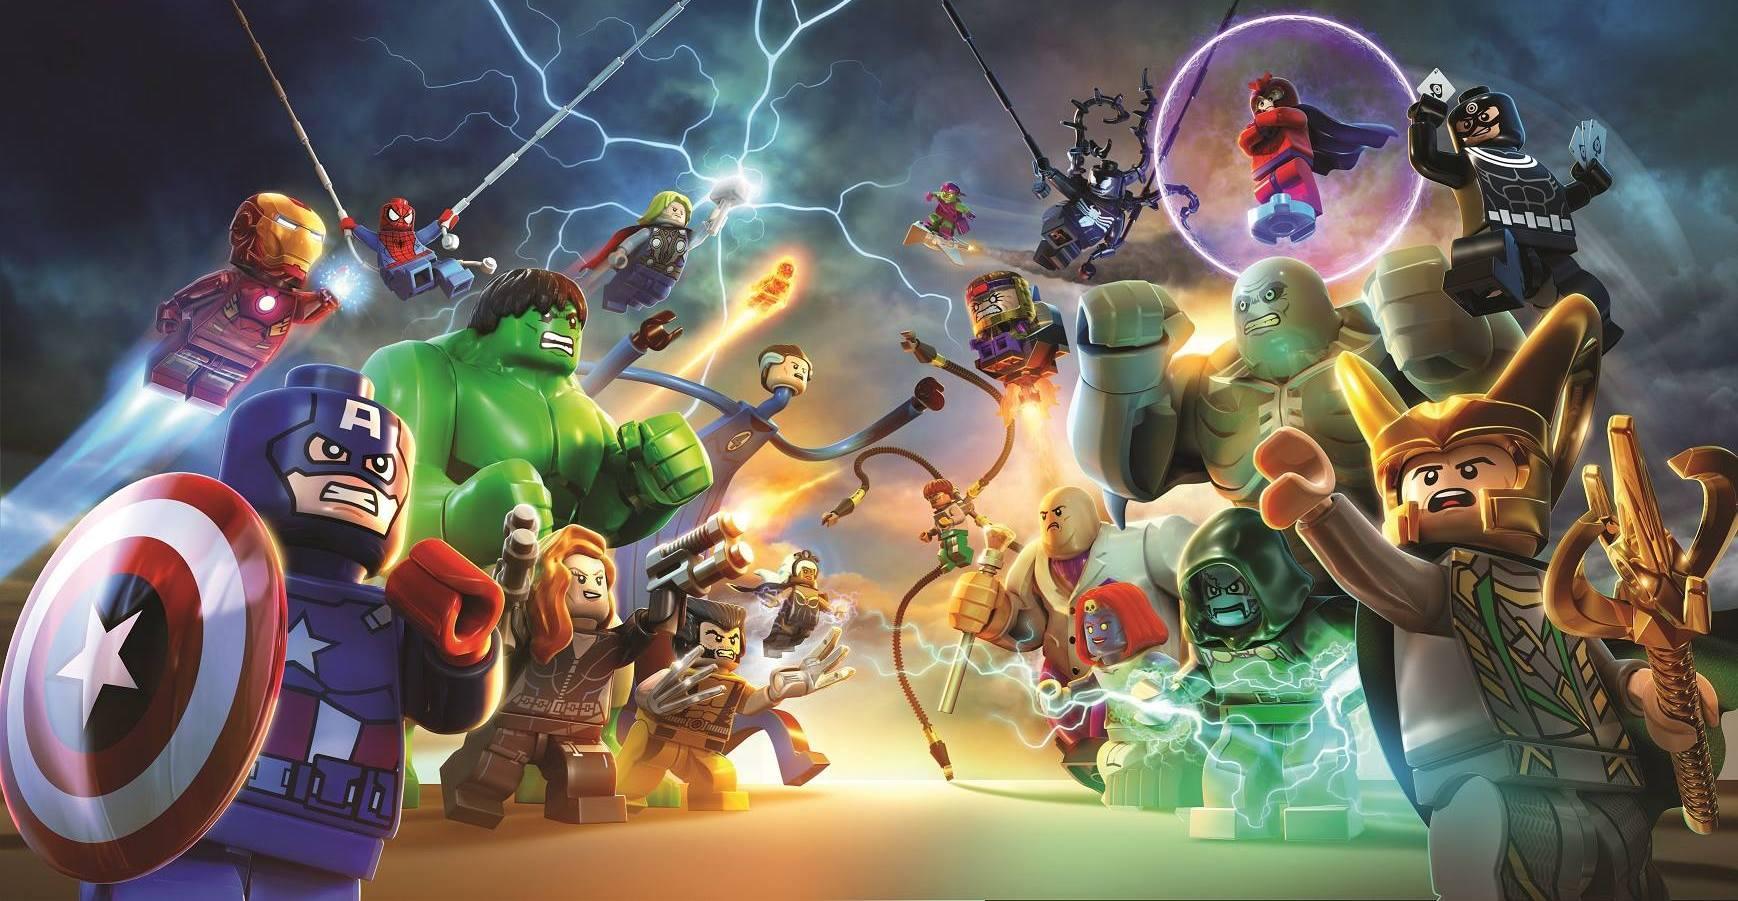 Картинки марвел супергерои лего